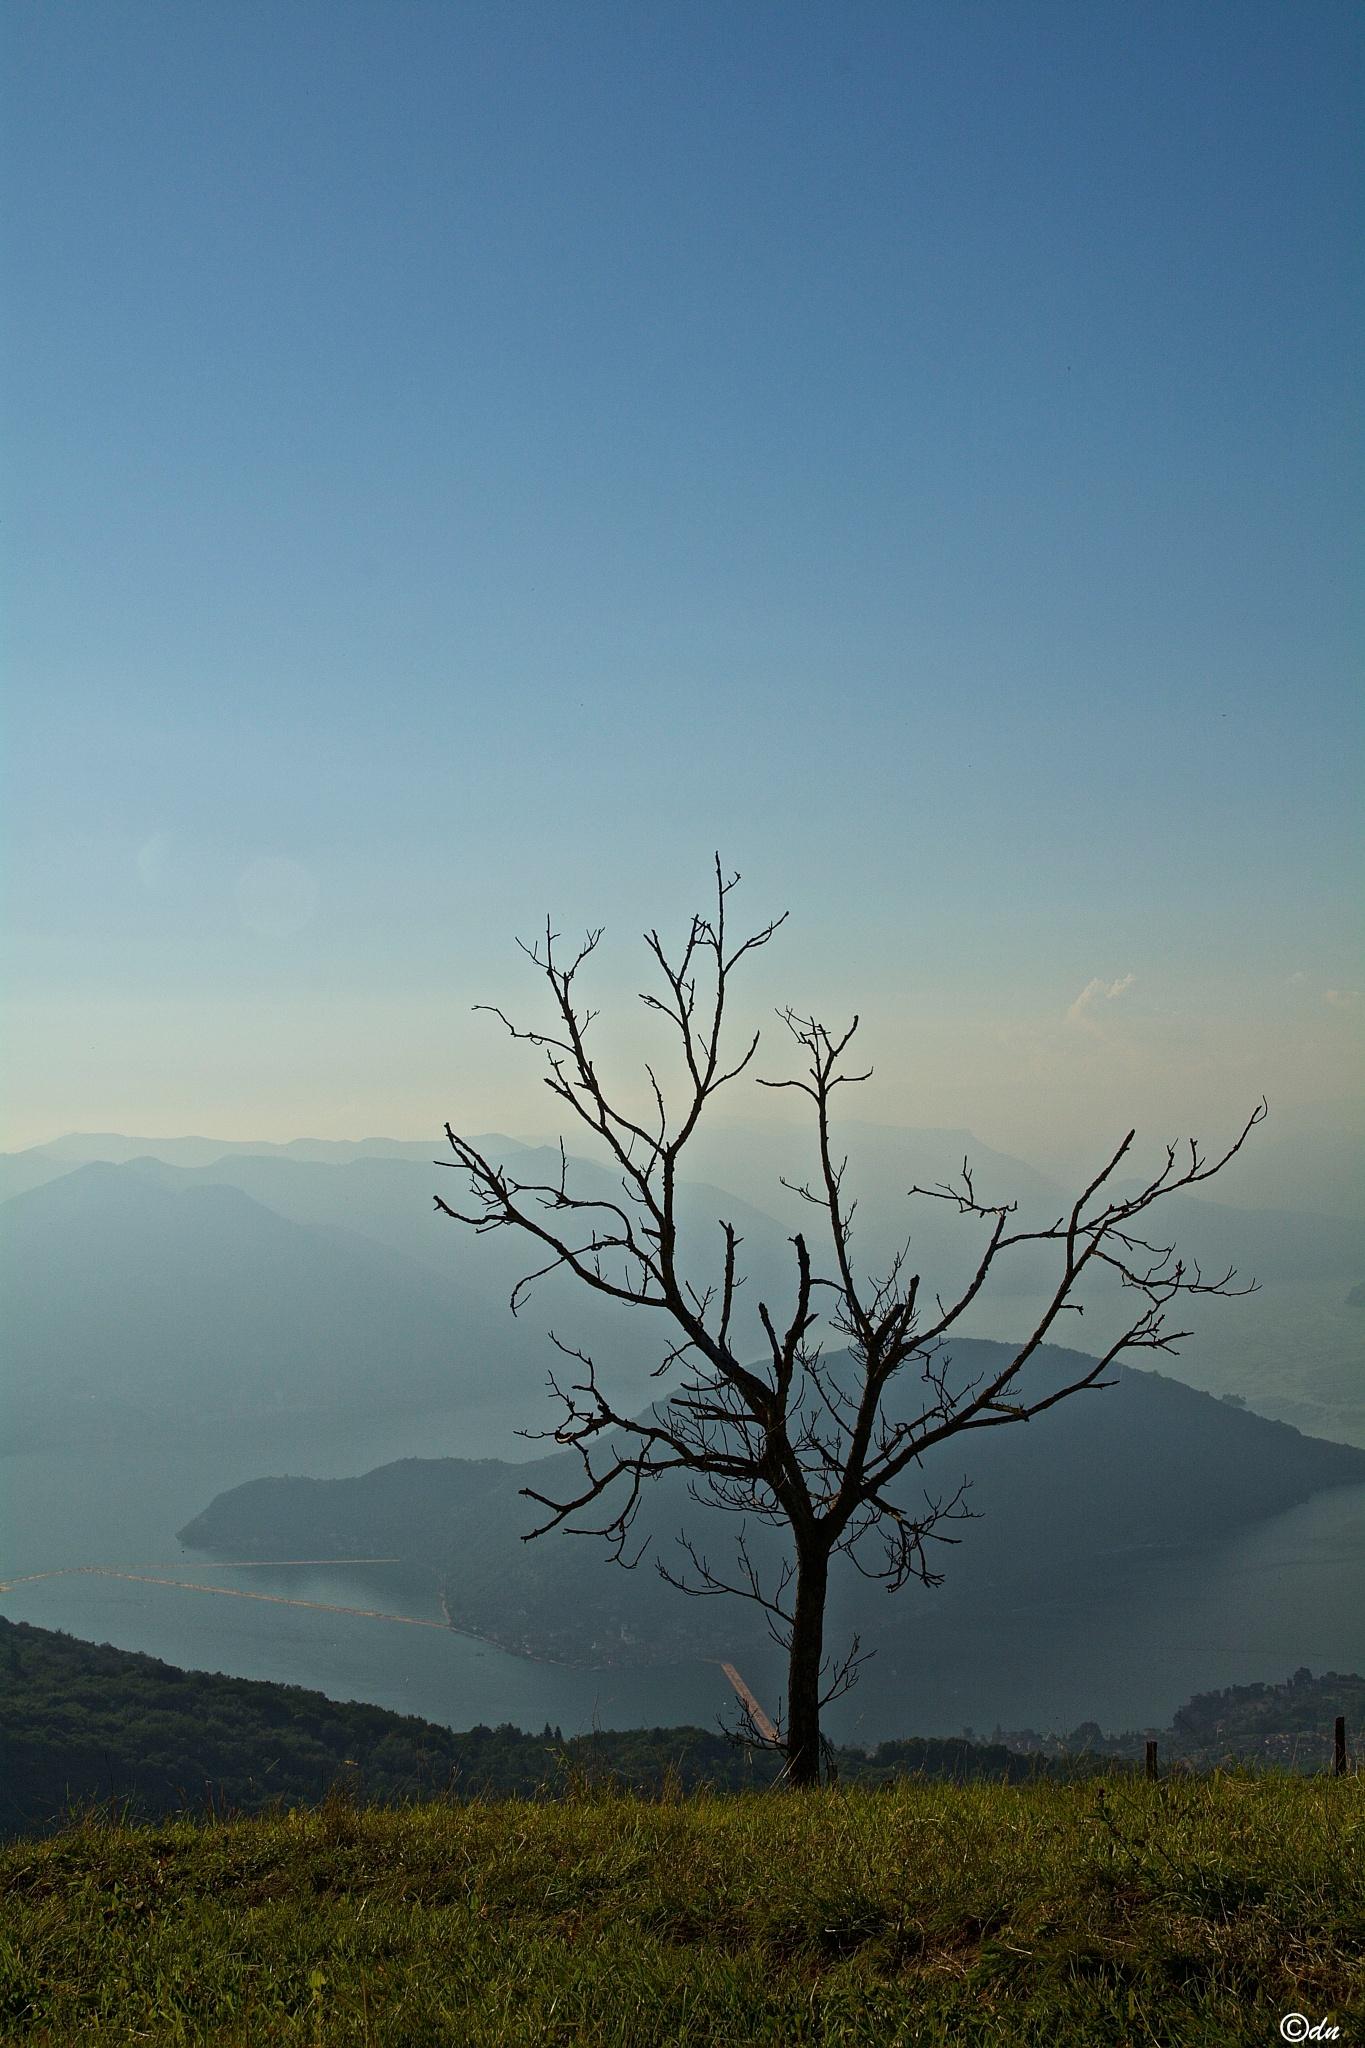 solo by DavideNegro